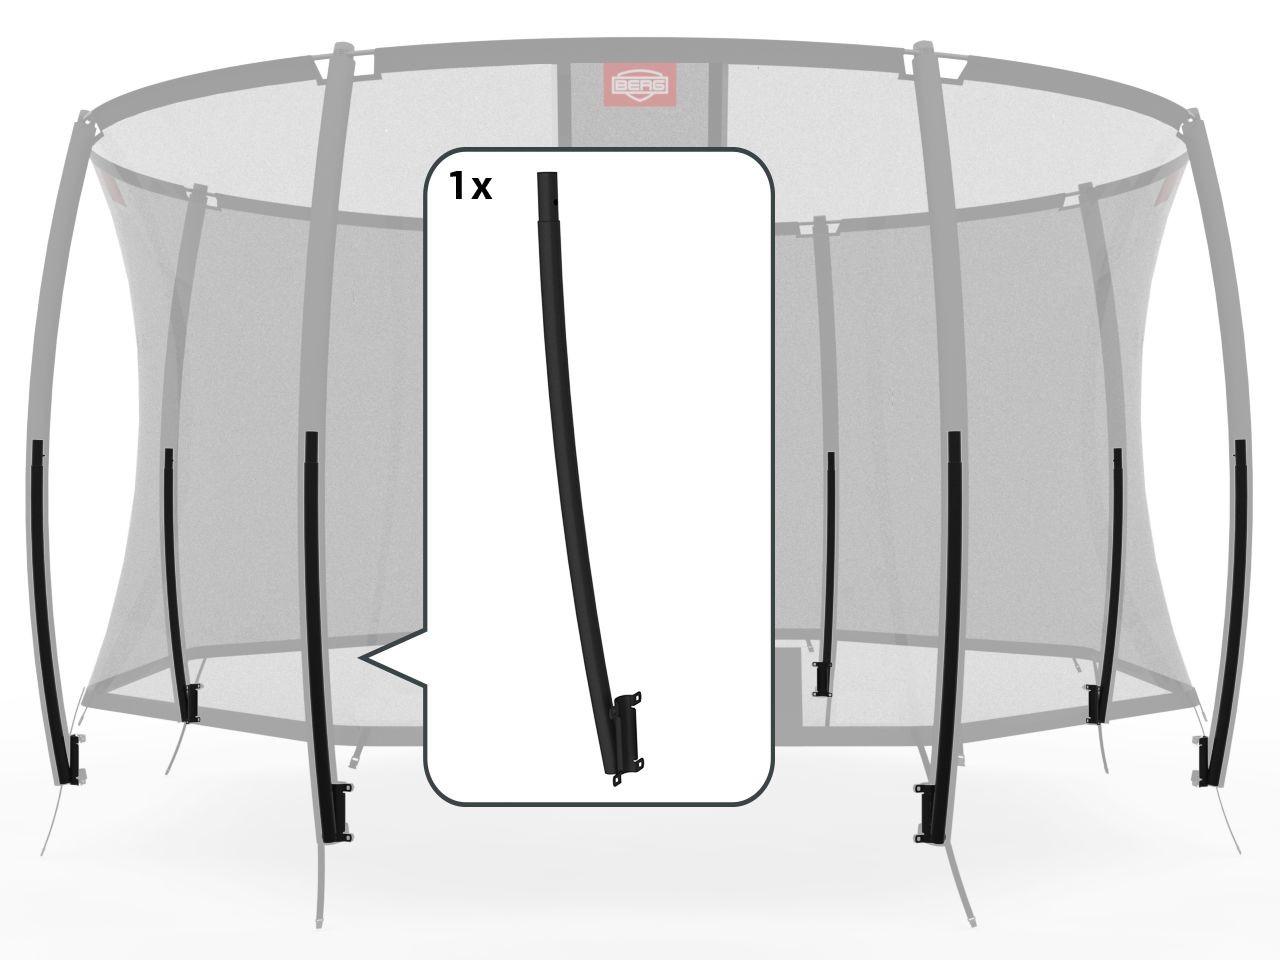 Safety Net Deluxe - Lower tube welded